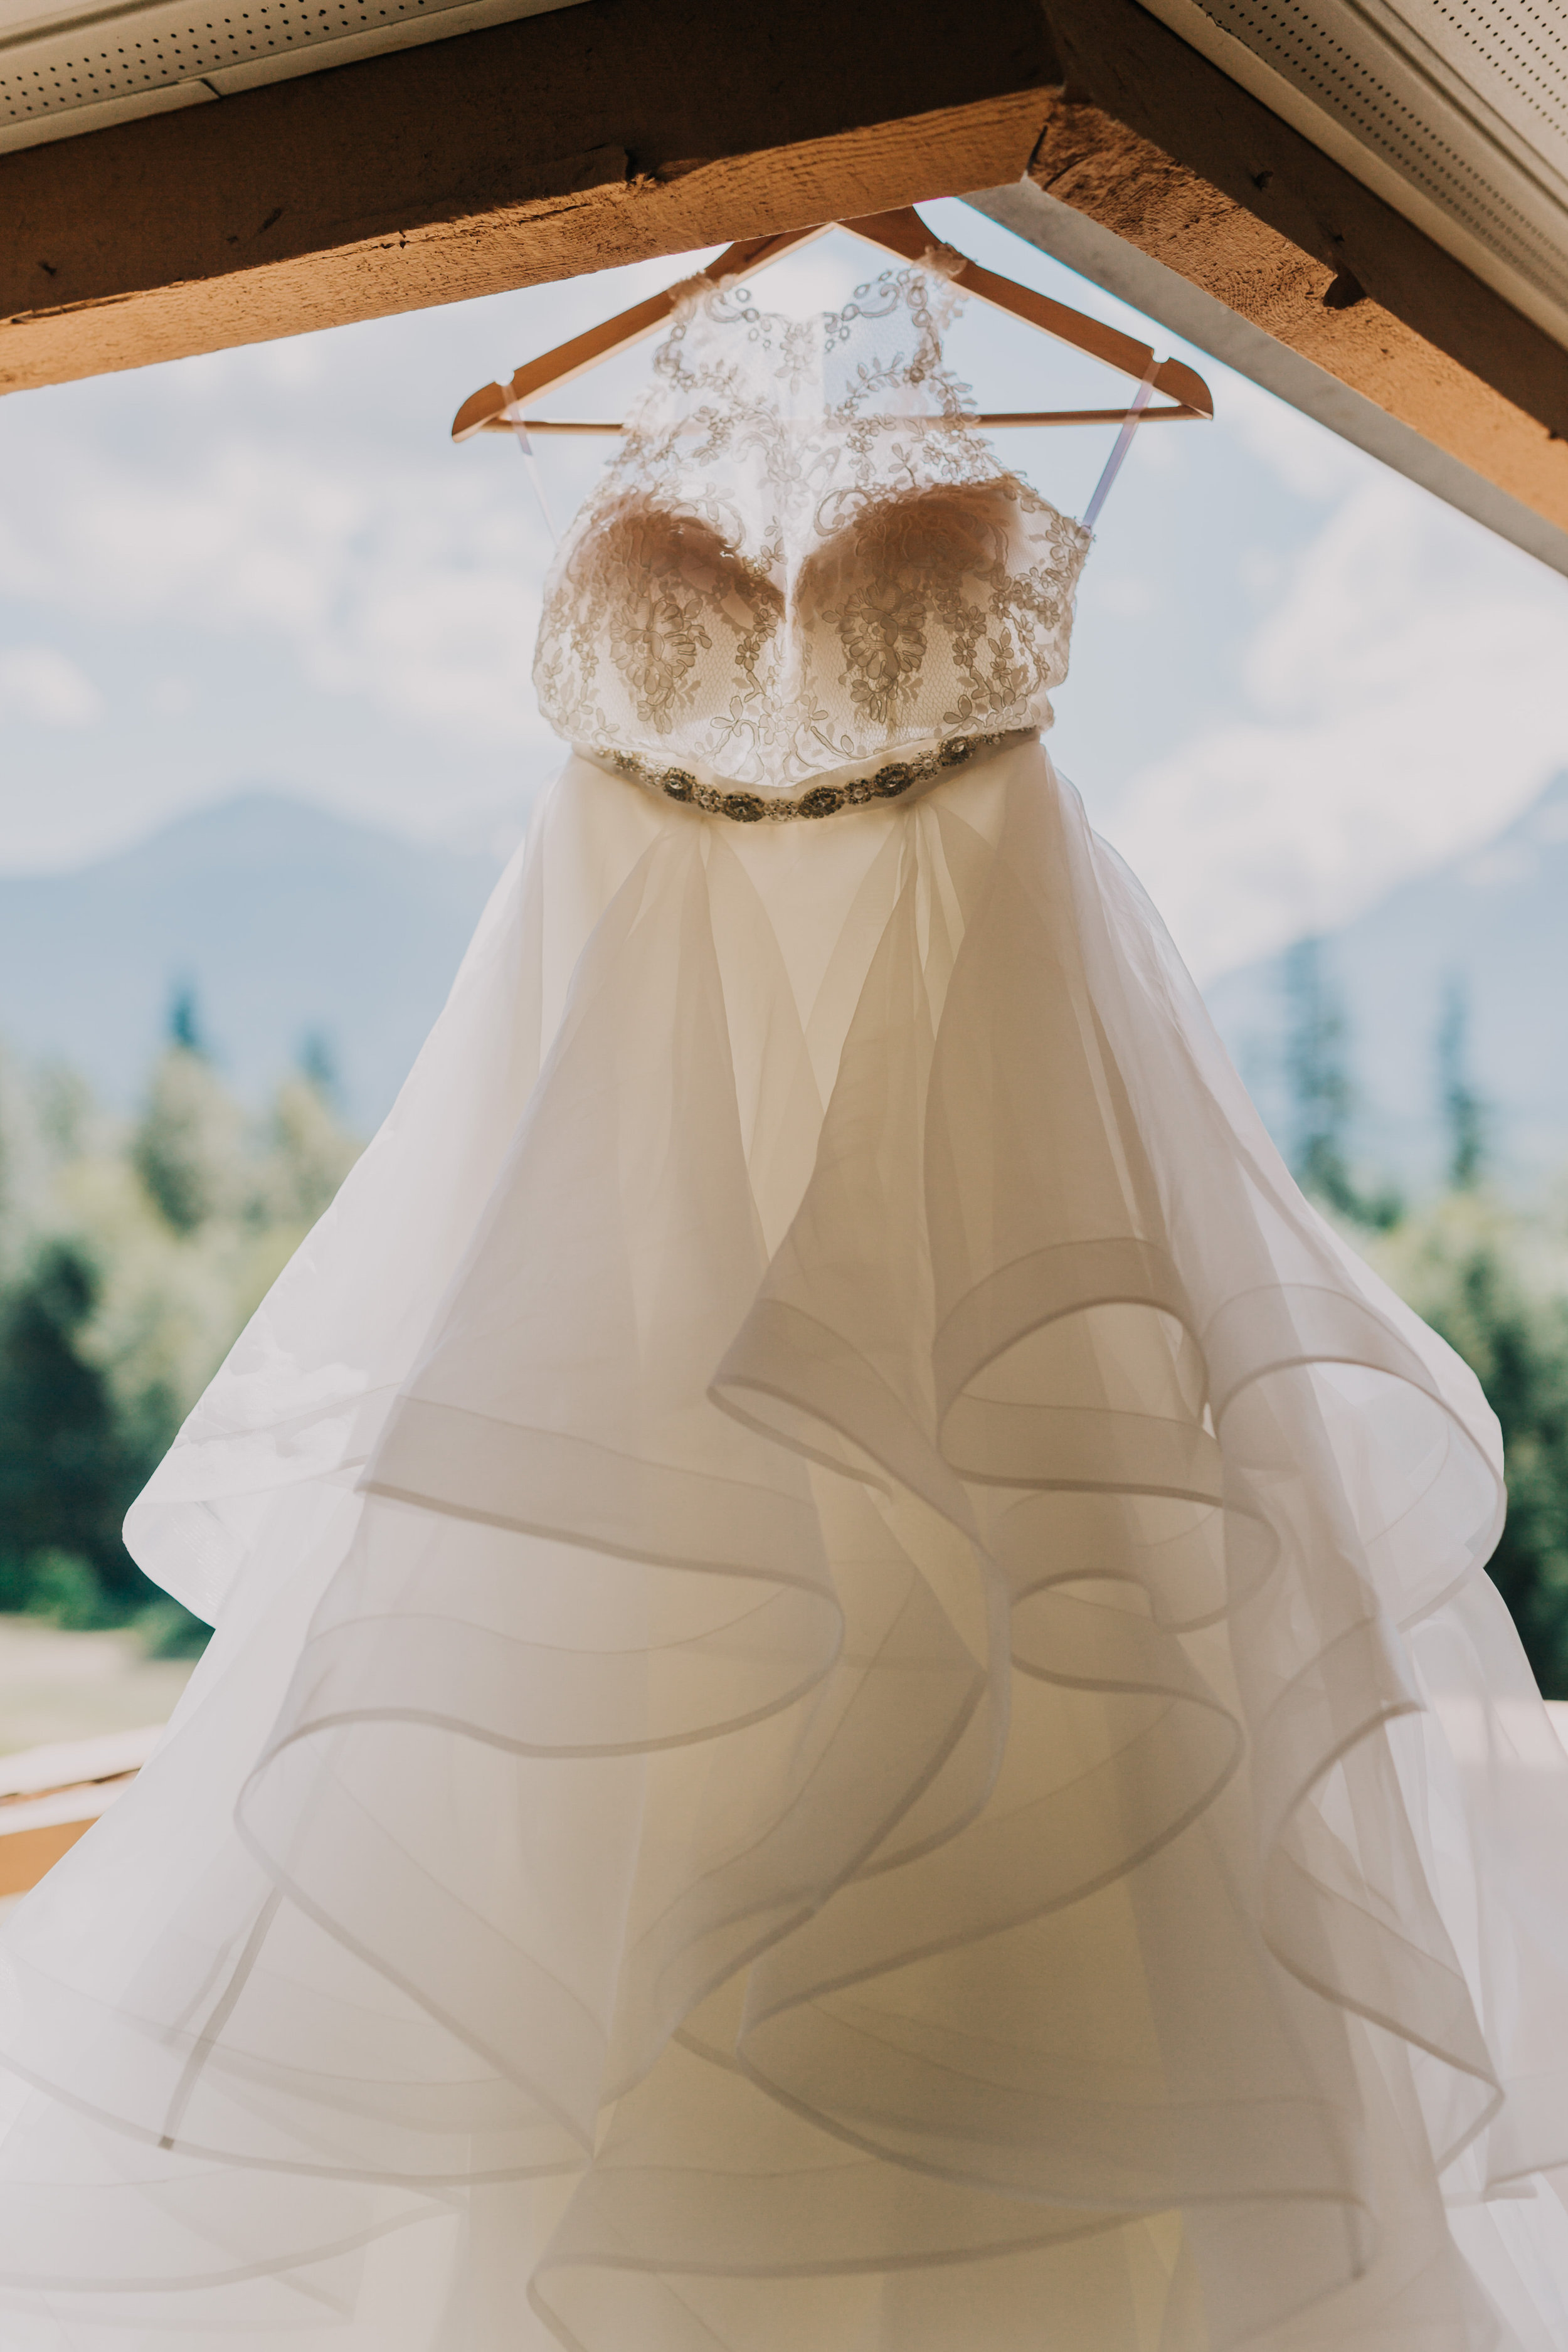 Squamish Wedding Photographer - Sea to Sky Gondola Wedding Photos -  Vancouver Wedding Photographer & Videographer - Sunshine Coast Wedding Photos - Sunshine Coast Wedding Photographer - Jennifer Picard Photography - IMG_1625_1.jpg